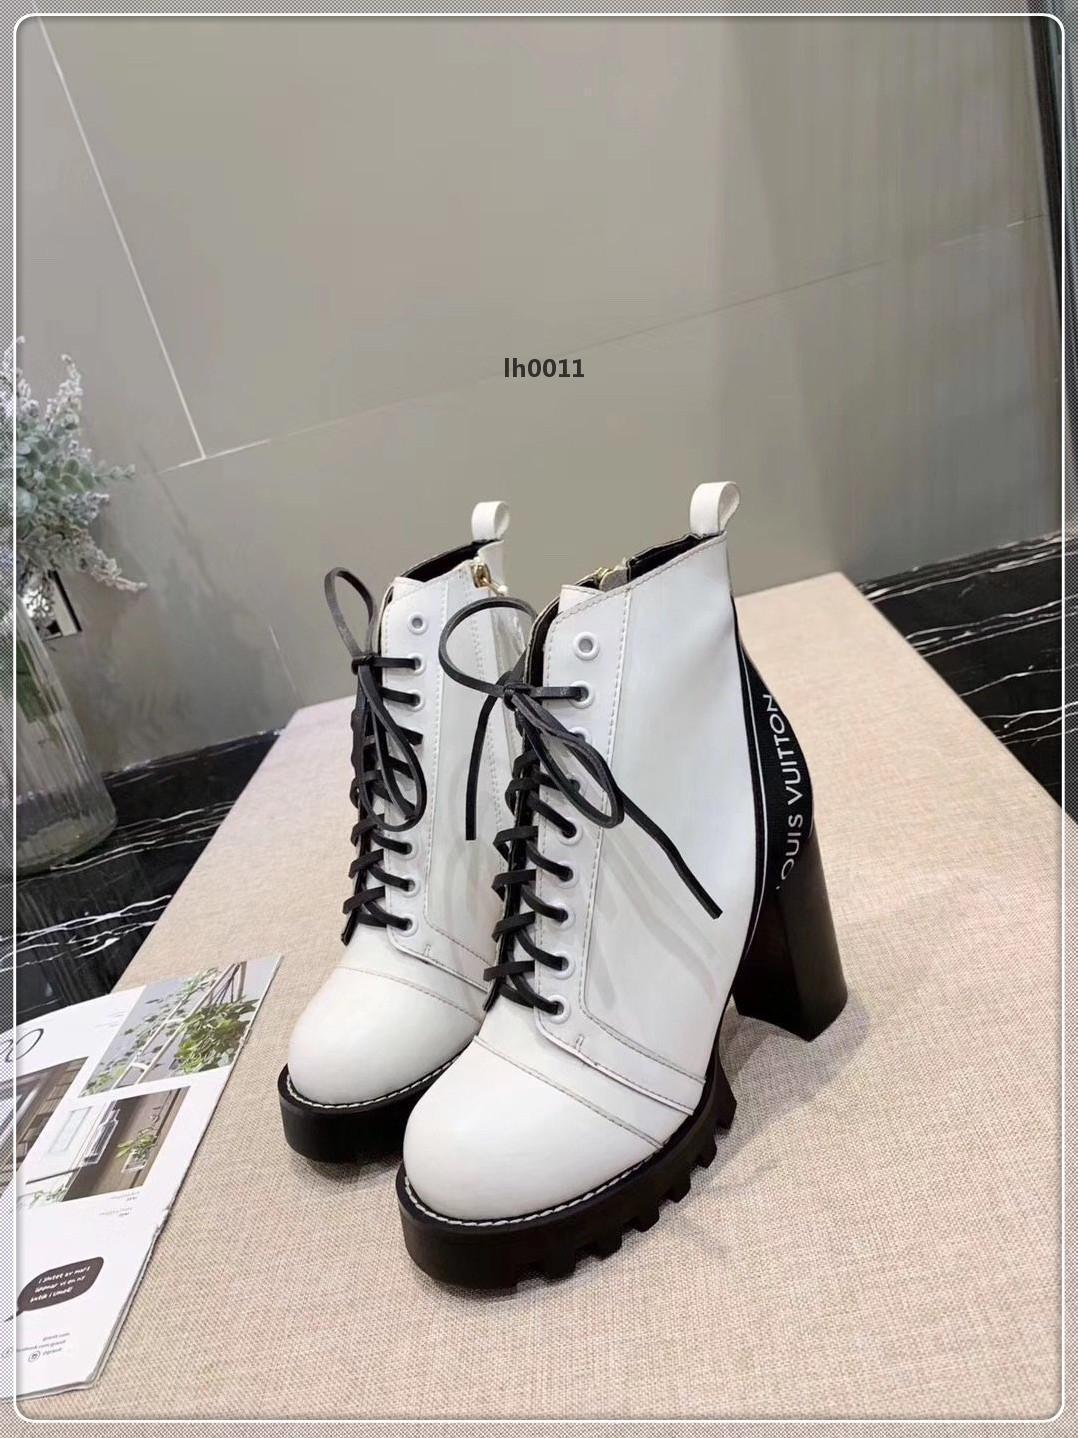 Chaussures femmes Bottes plate-forme Laureate Boot Mode d'hiver Bottes de neige femme Bottines Femmes Marque Taille 35-41